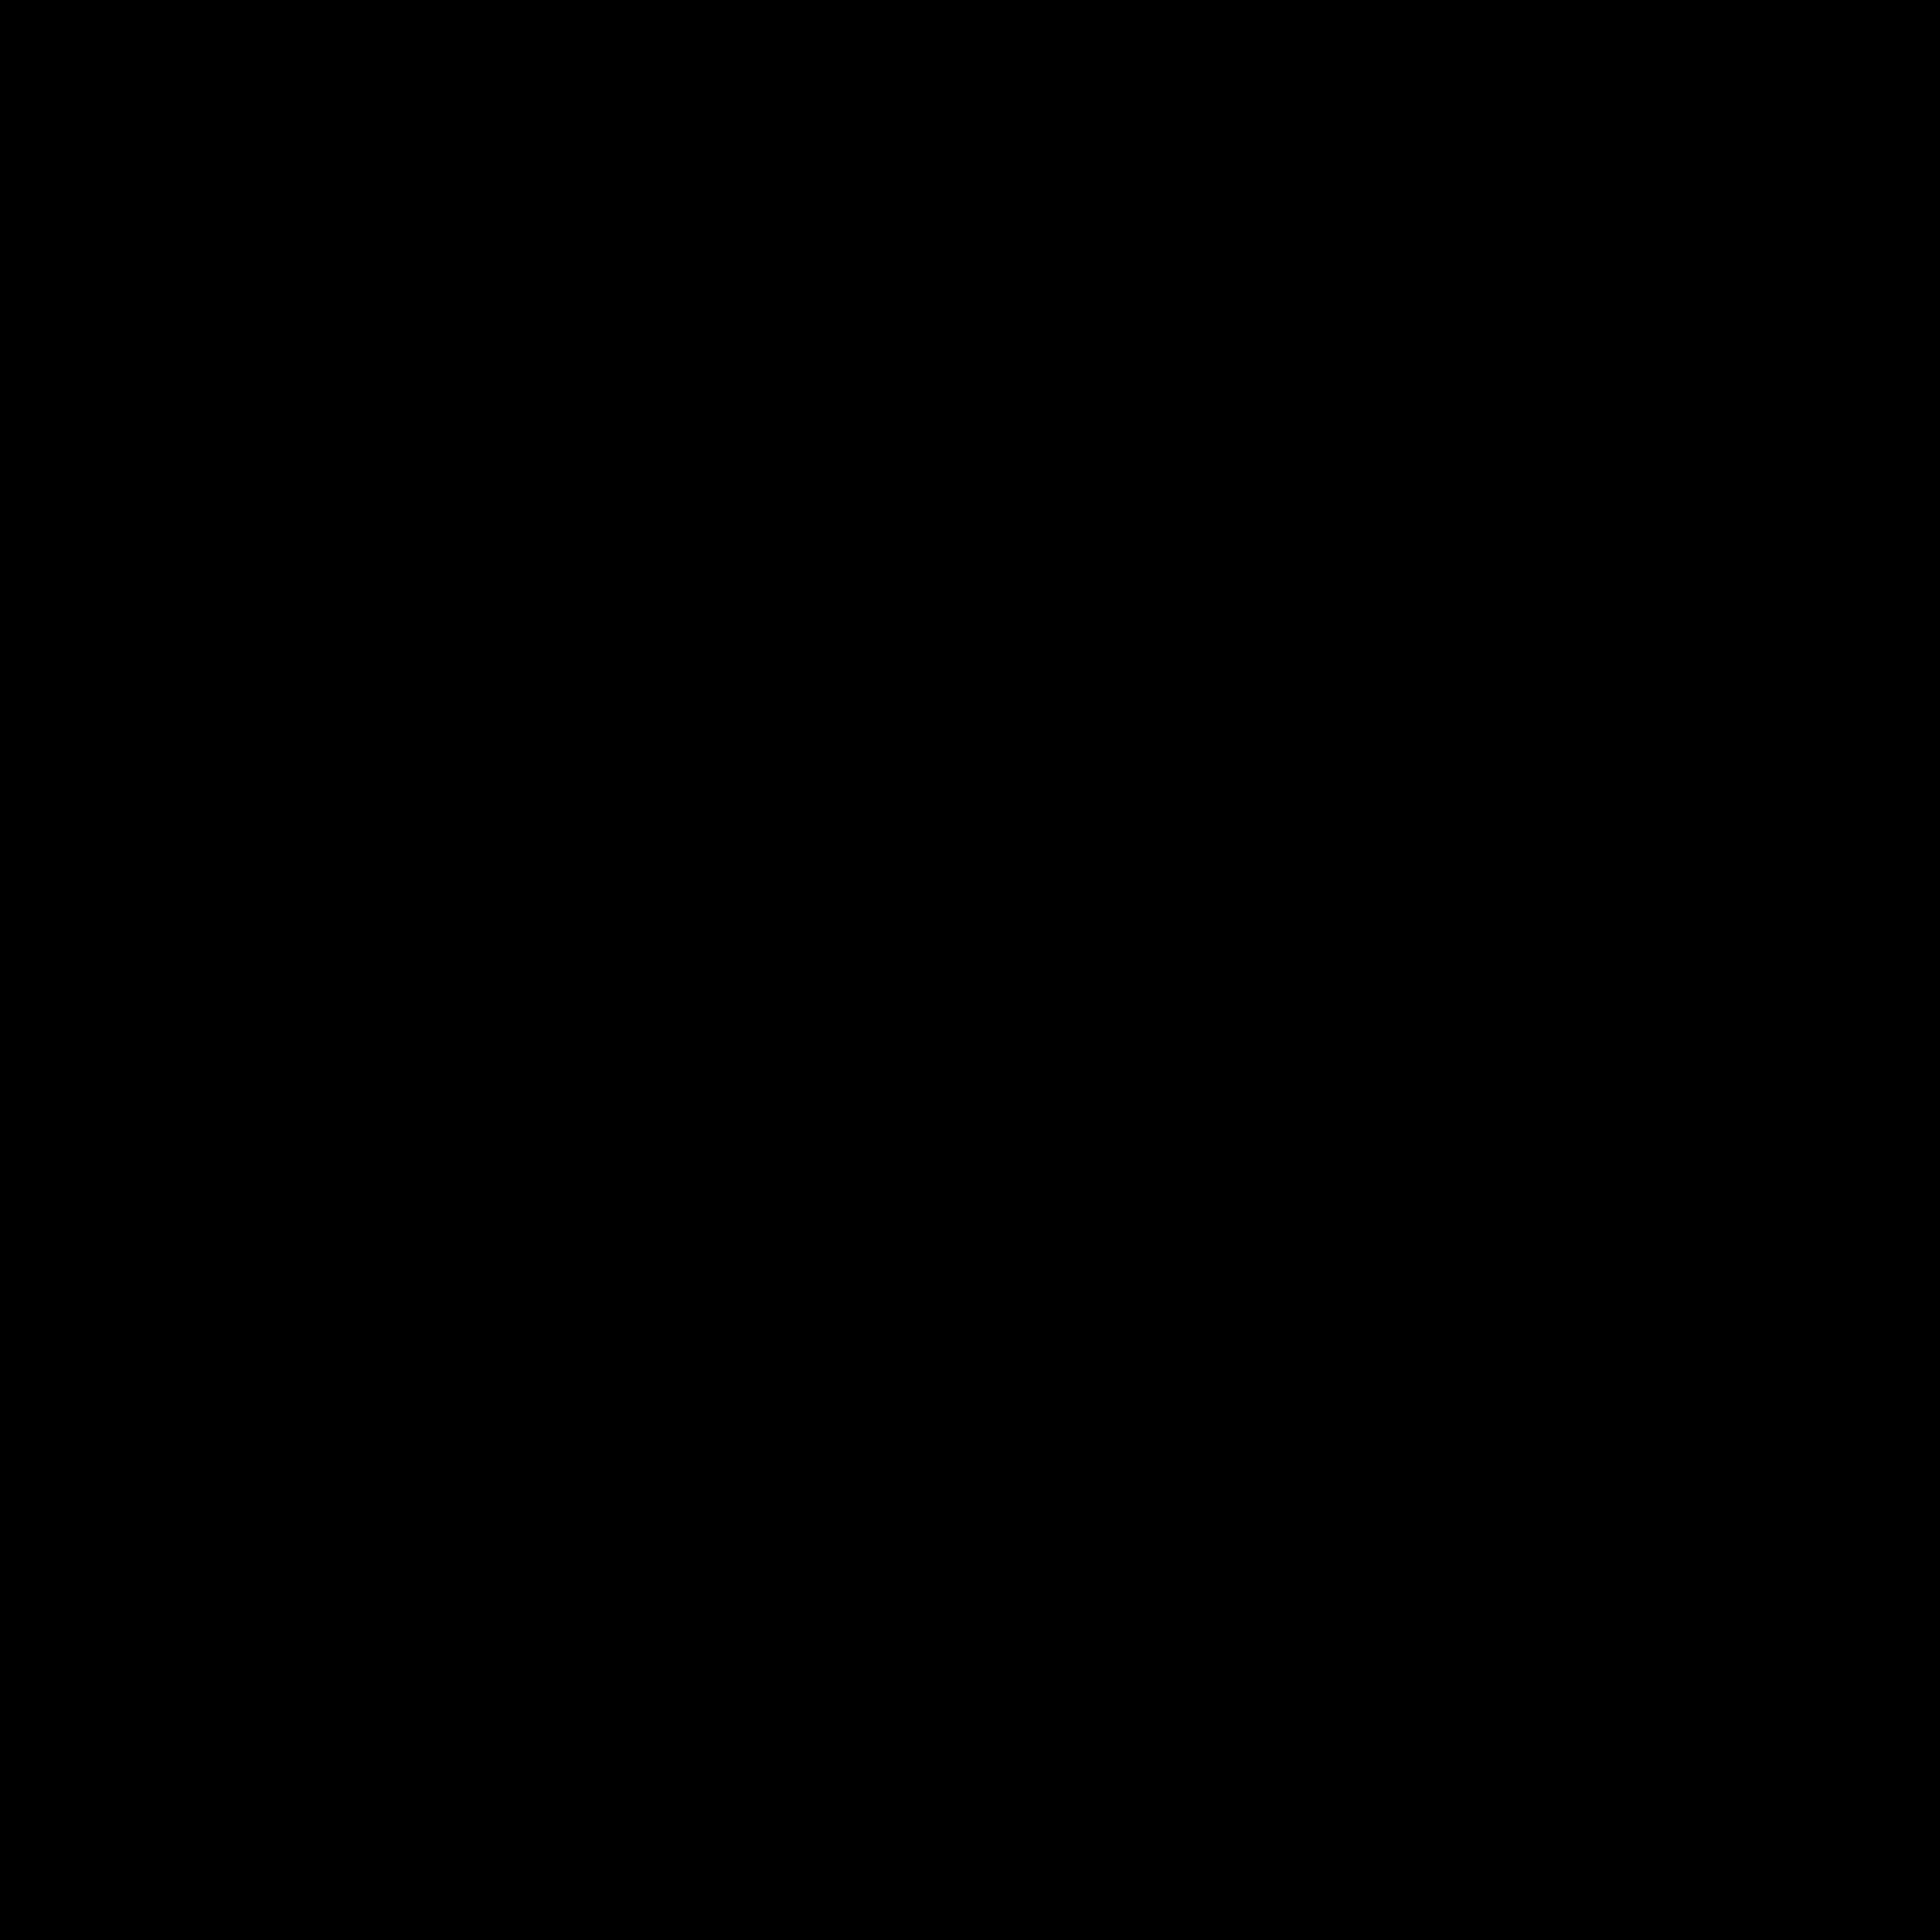 Nike Golf Logo PNG Transparent & SVG Vector - Freebie Supply - Nike Logo Design